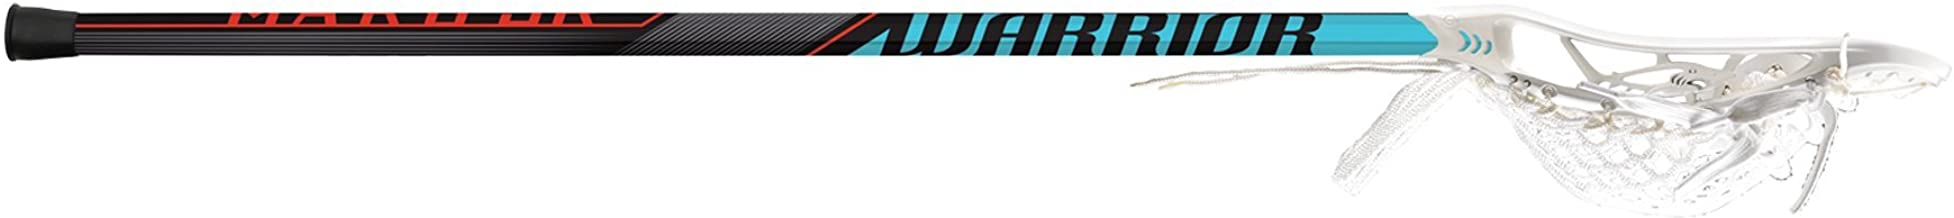 WARRIOR Regulator Max Unstrung Lacrosse Sticks Army Green Brine-Warrior Lacrosse RMXUN